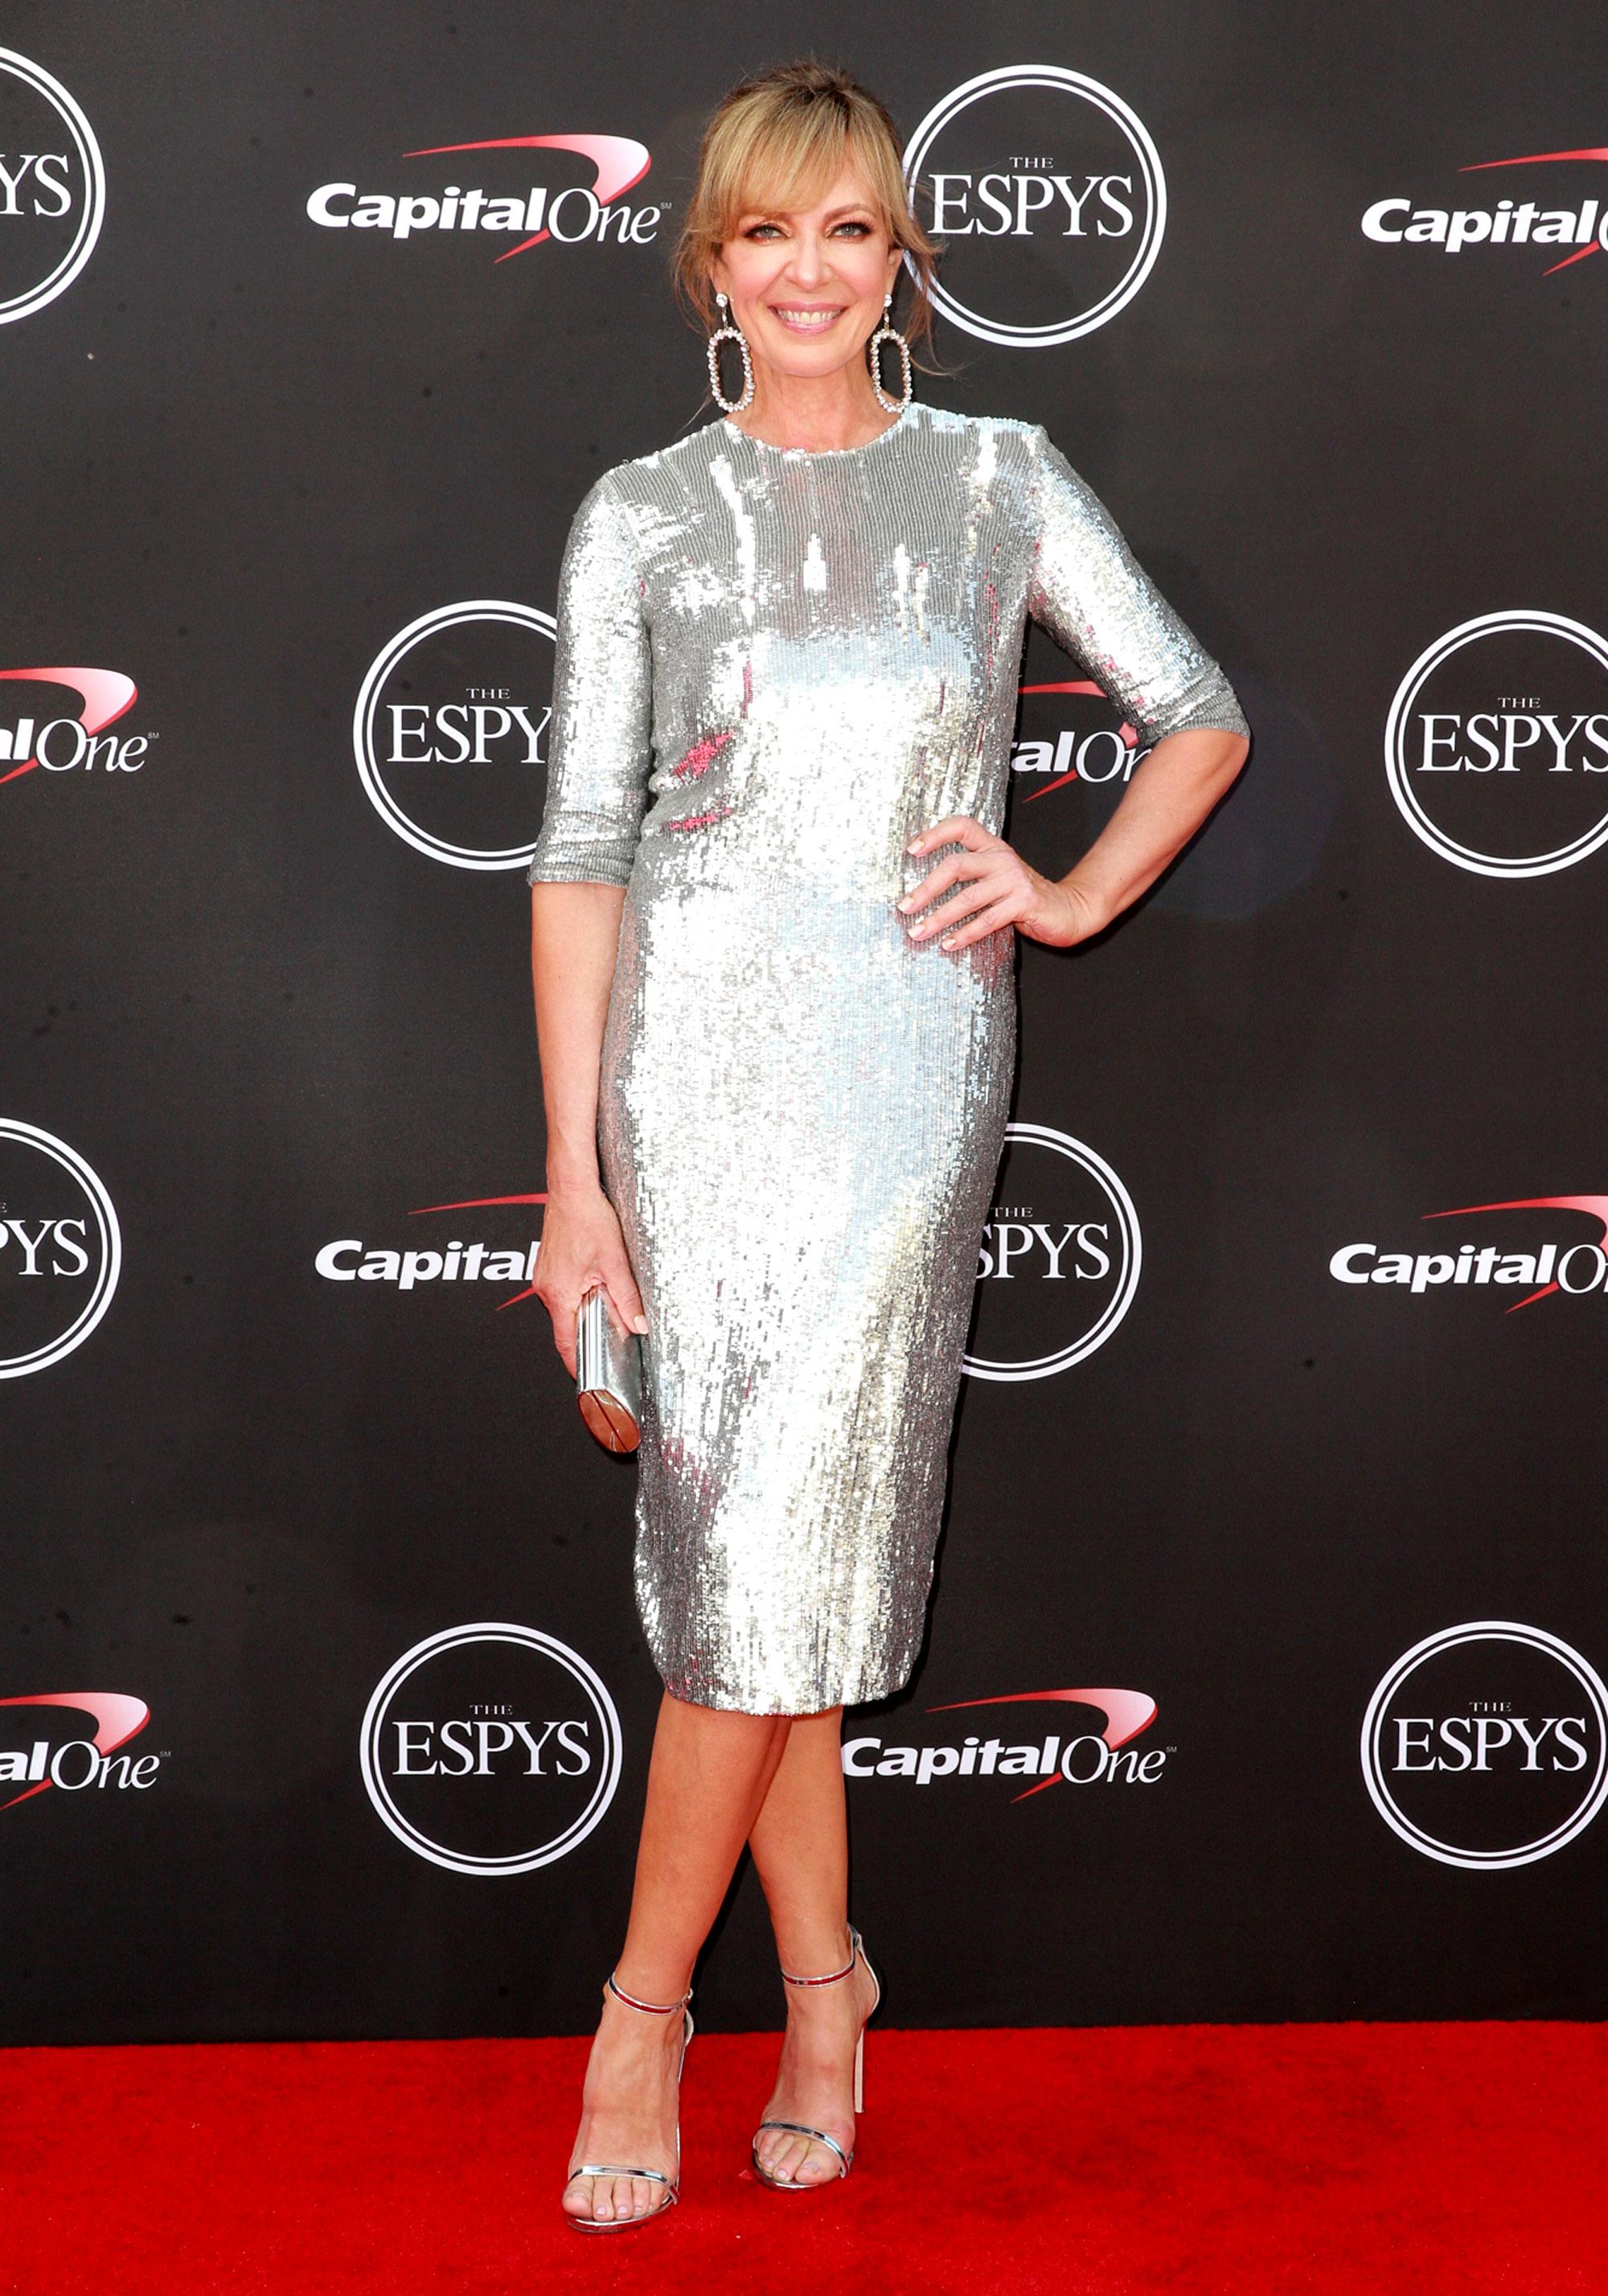 Allison-Janney espys - Wearing a silver sequins Jeffrey Dodd midi and matching metallic sandals.